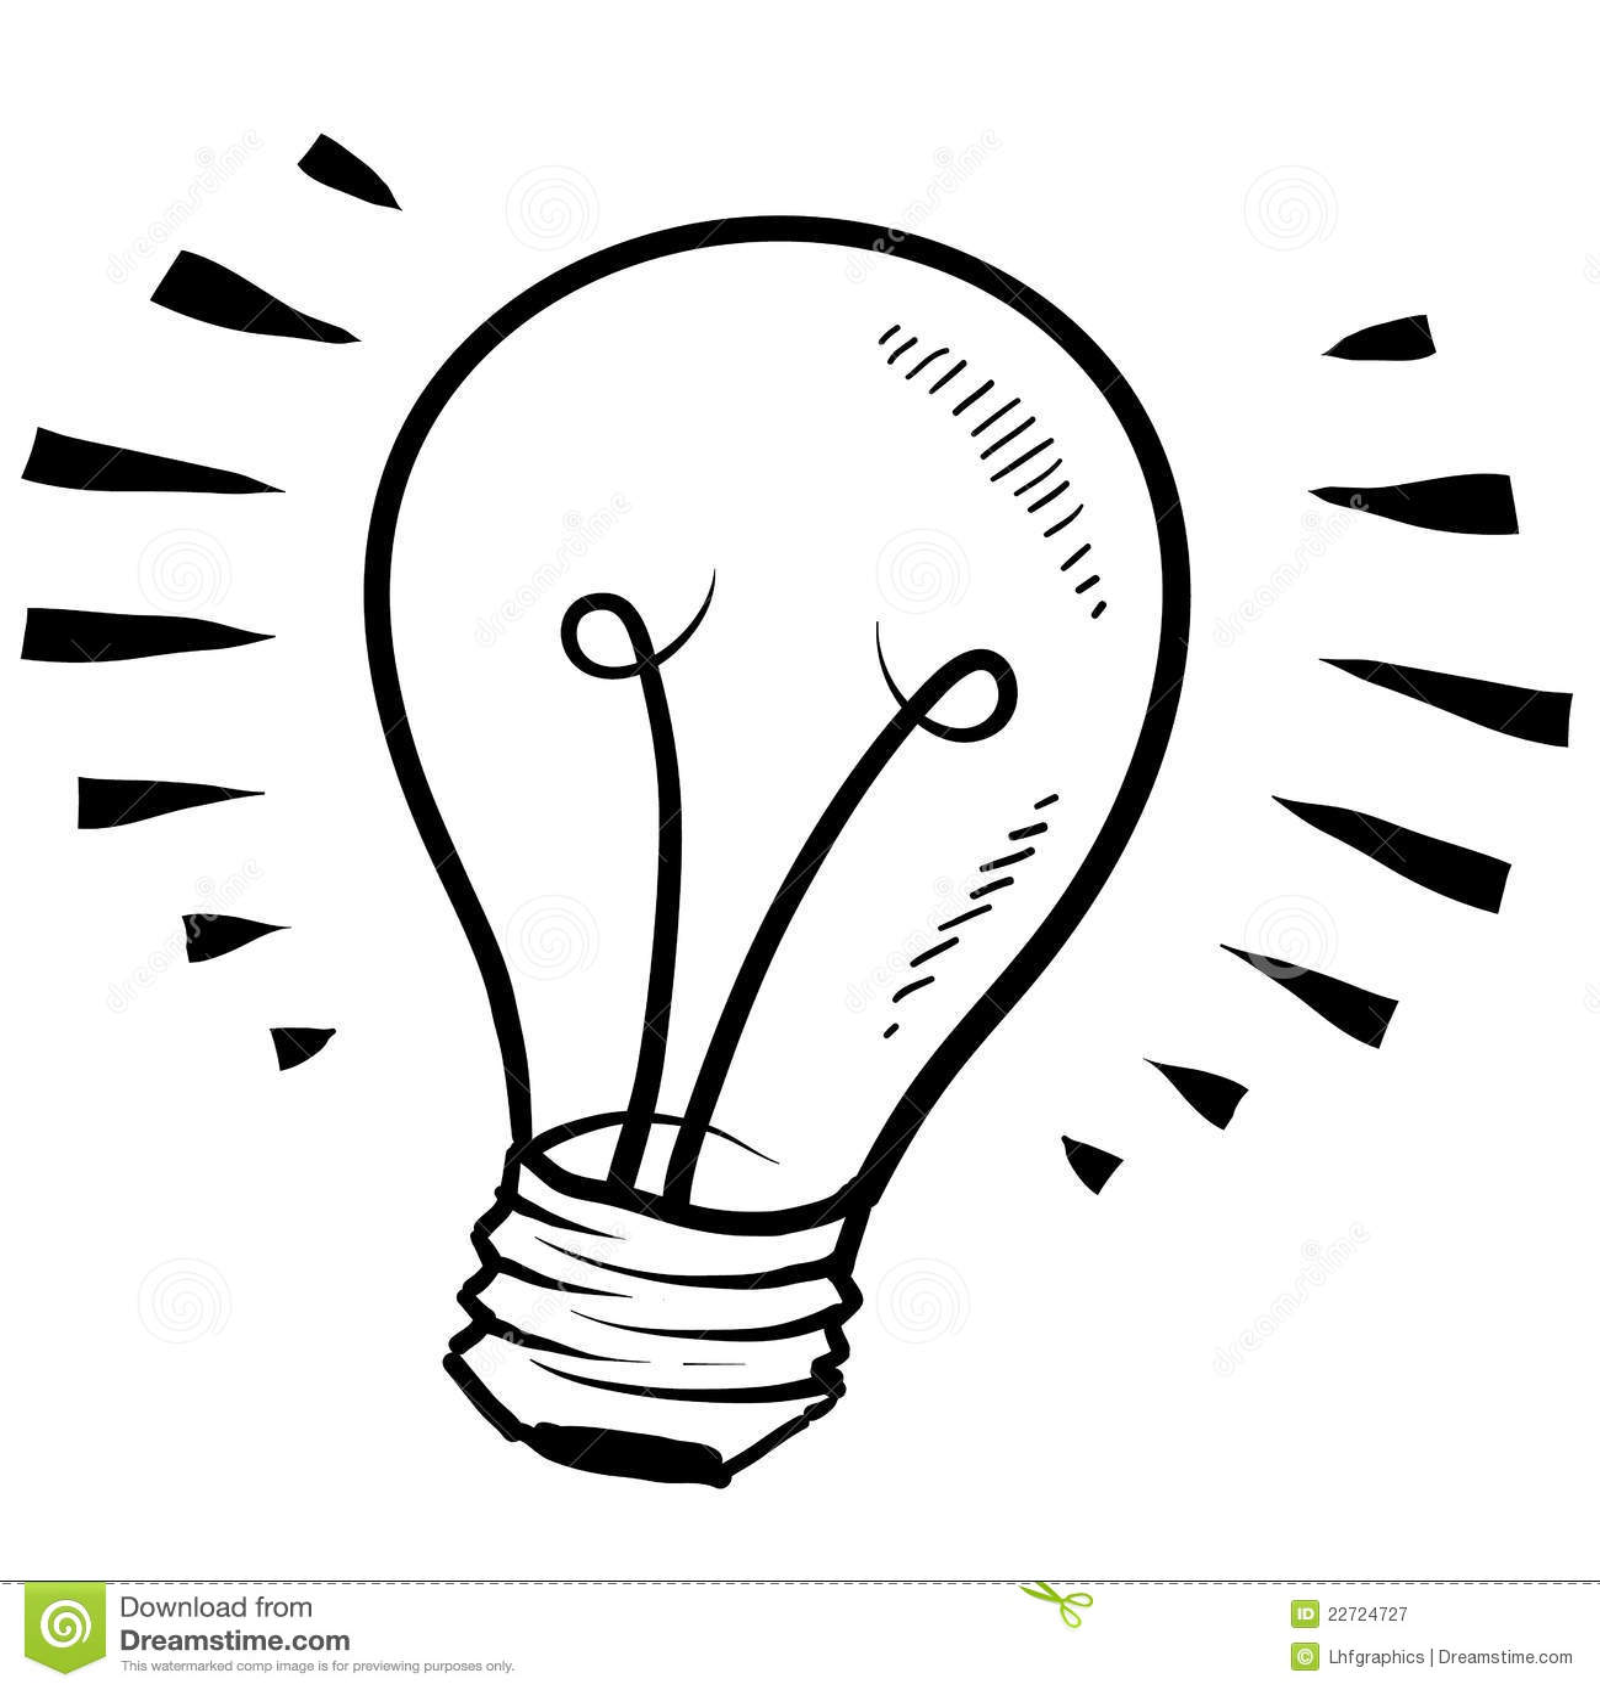 Light Bulb Sketch Royalty Free Stock Photography